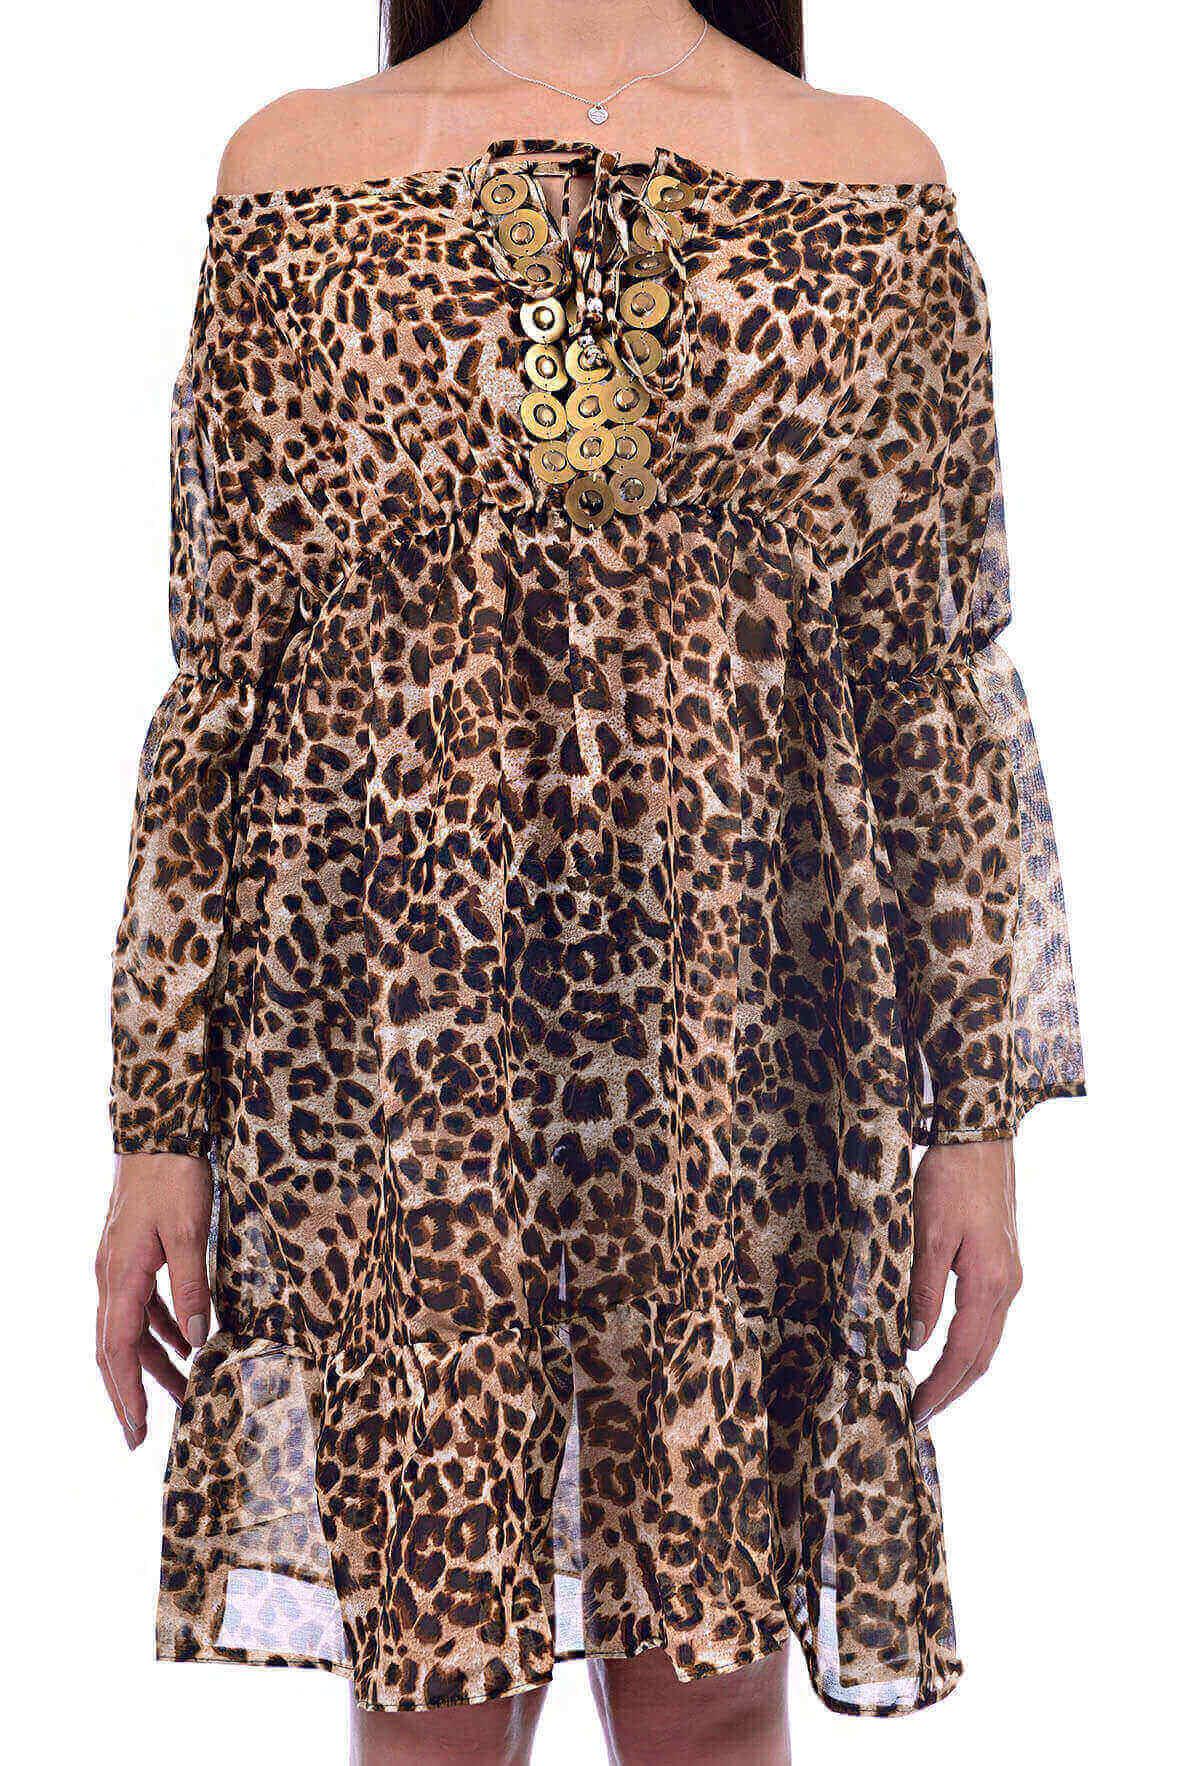 Vestido Ombro a Ombro com Pedraria no Decote Animal Print